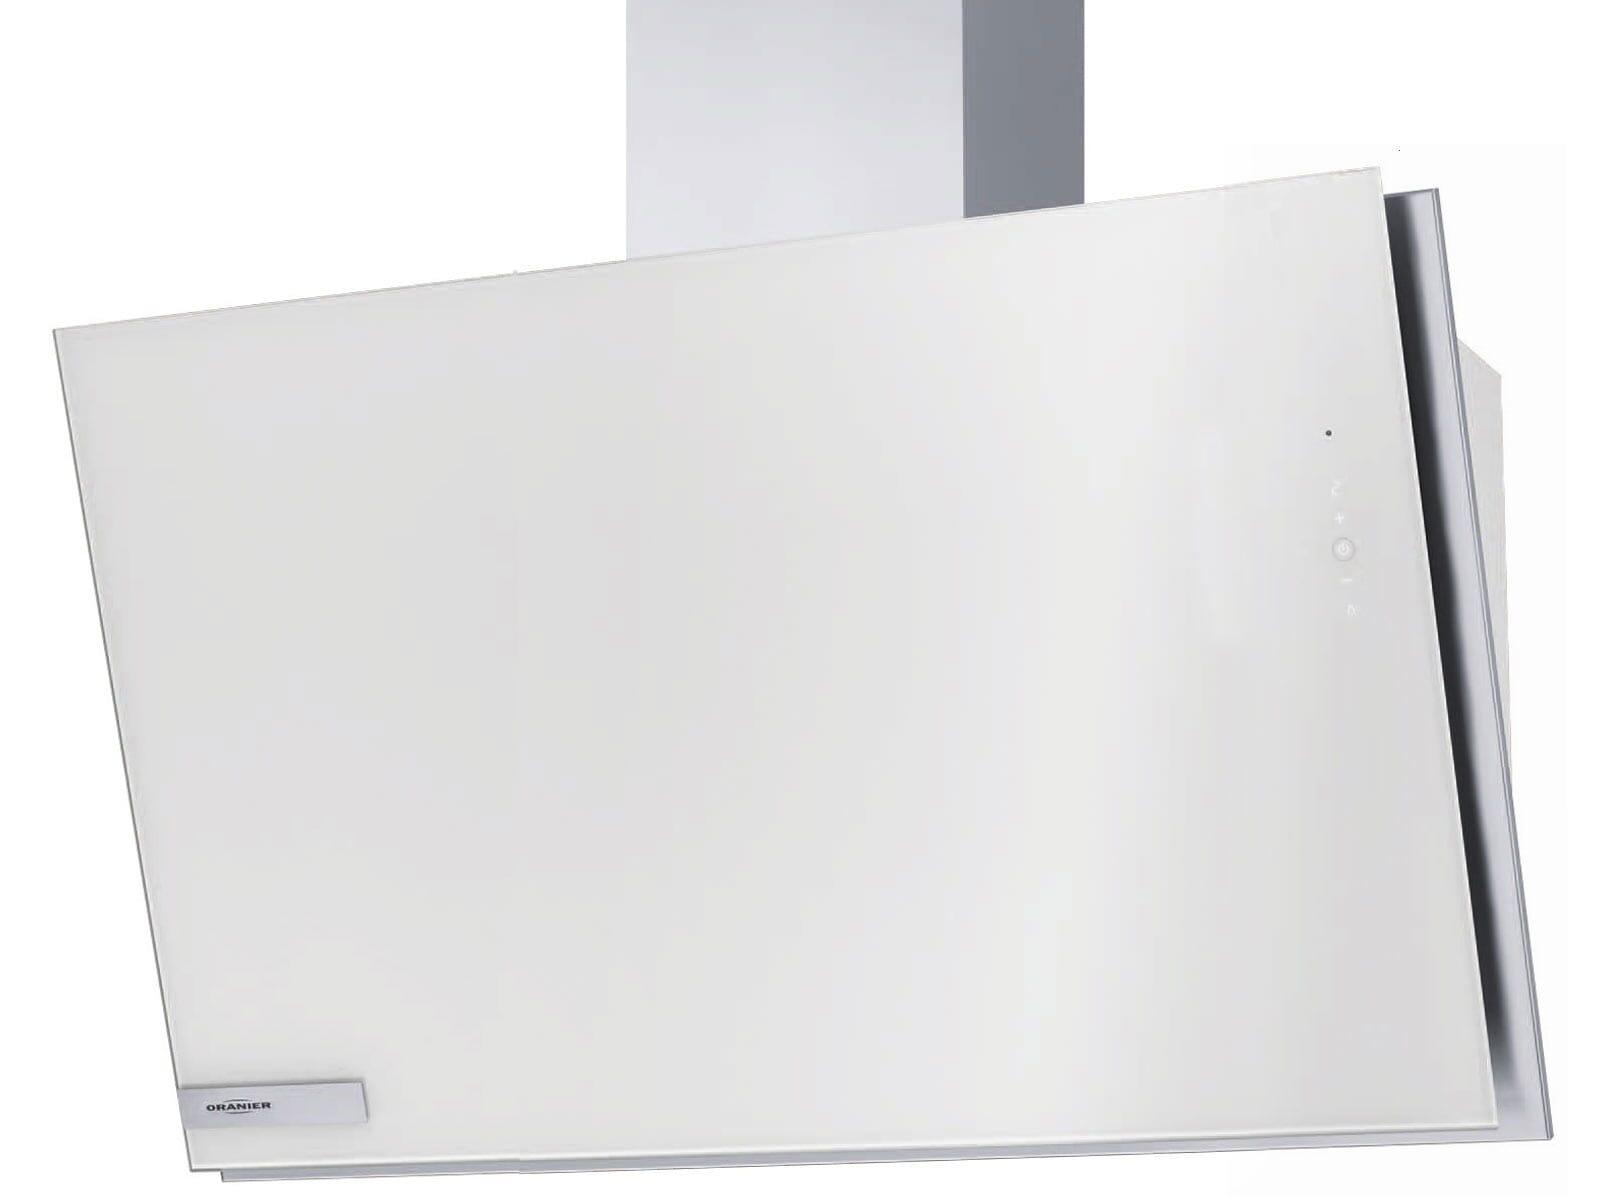 Oranier Davara 90 W - 8634 90 Kopffreihaube Weiß